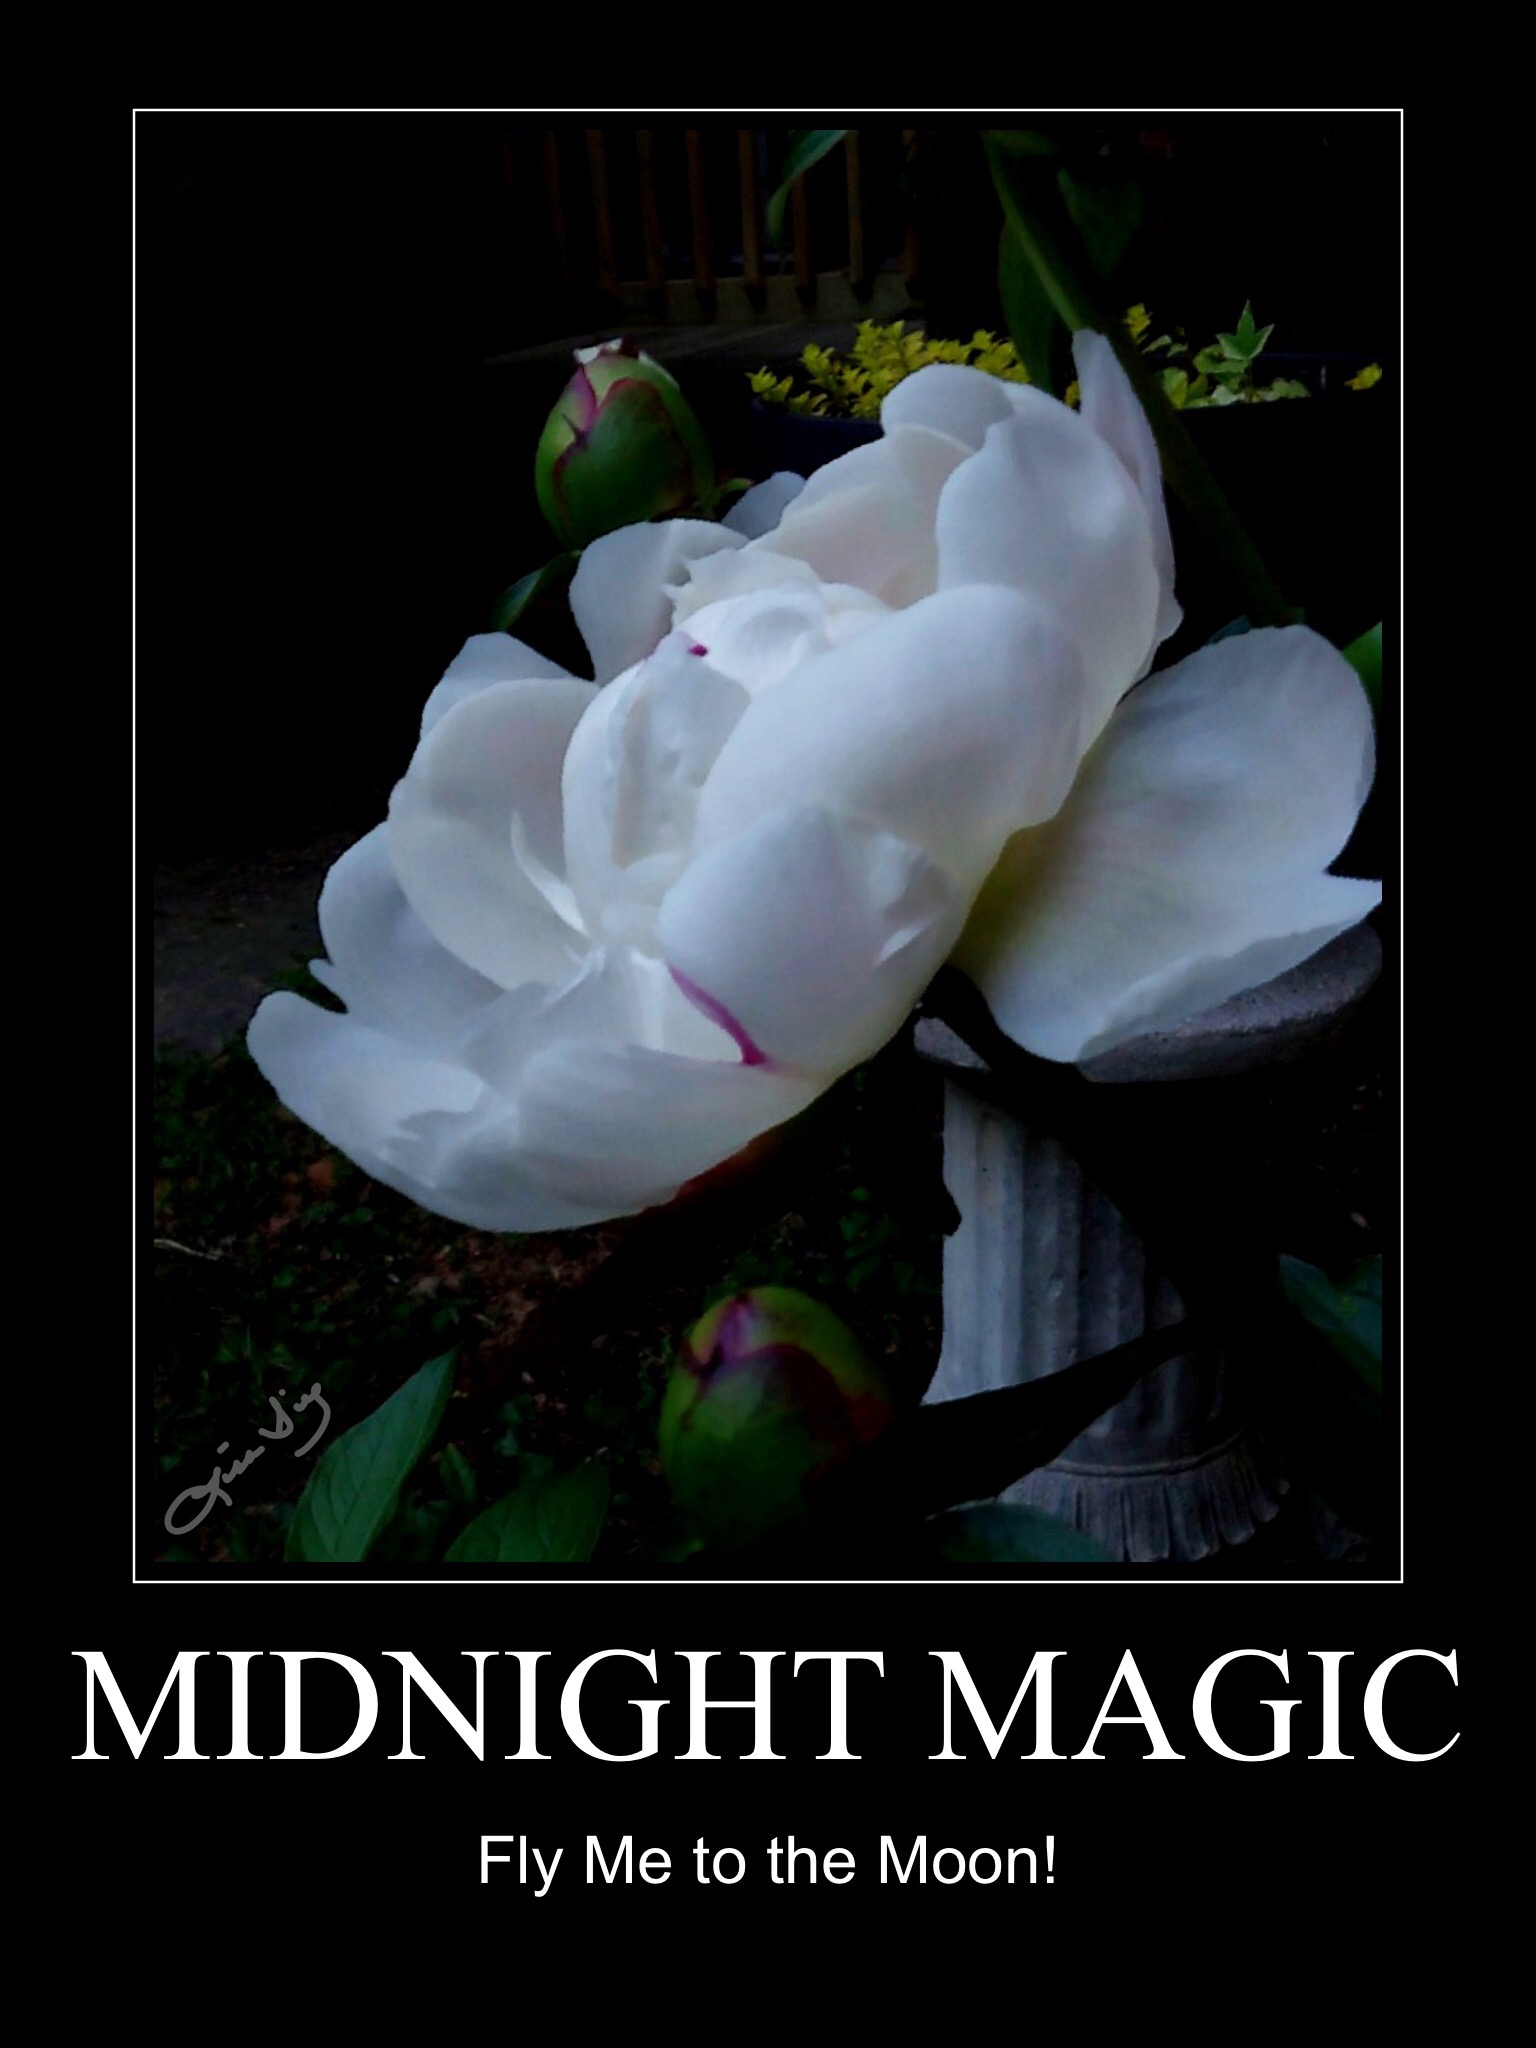 Midnight Magic poster.JPG